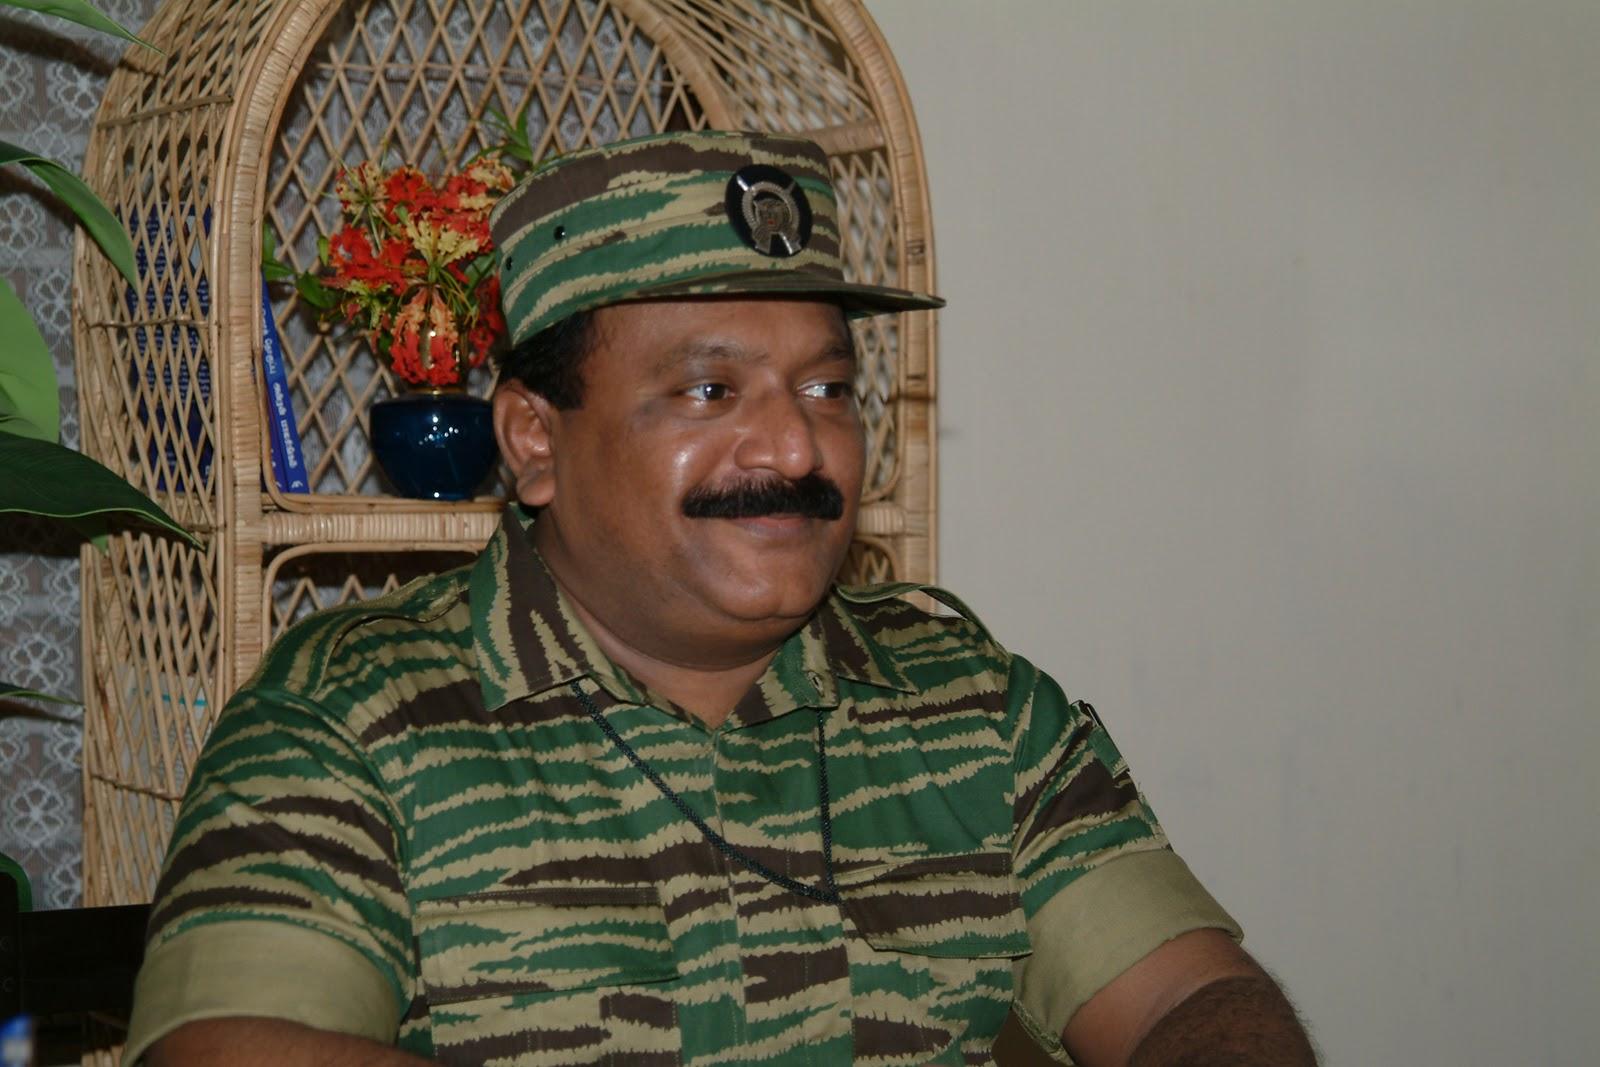 Velupillai Prabhakaran – Wikipedia